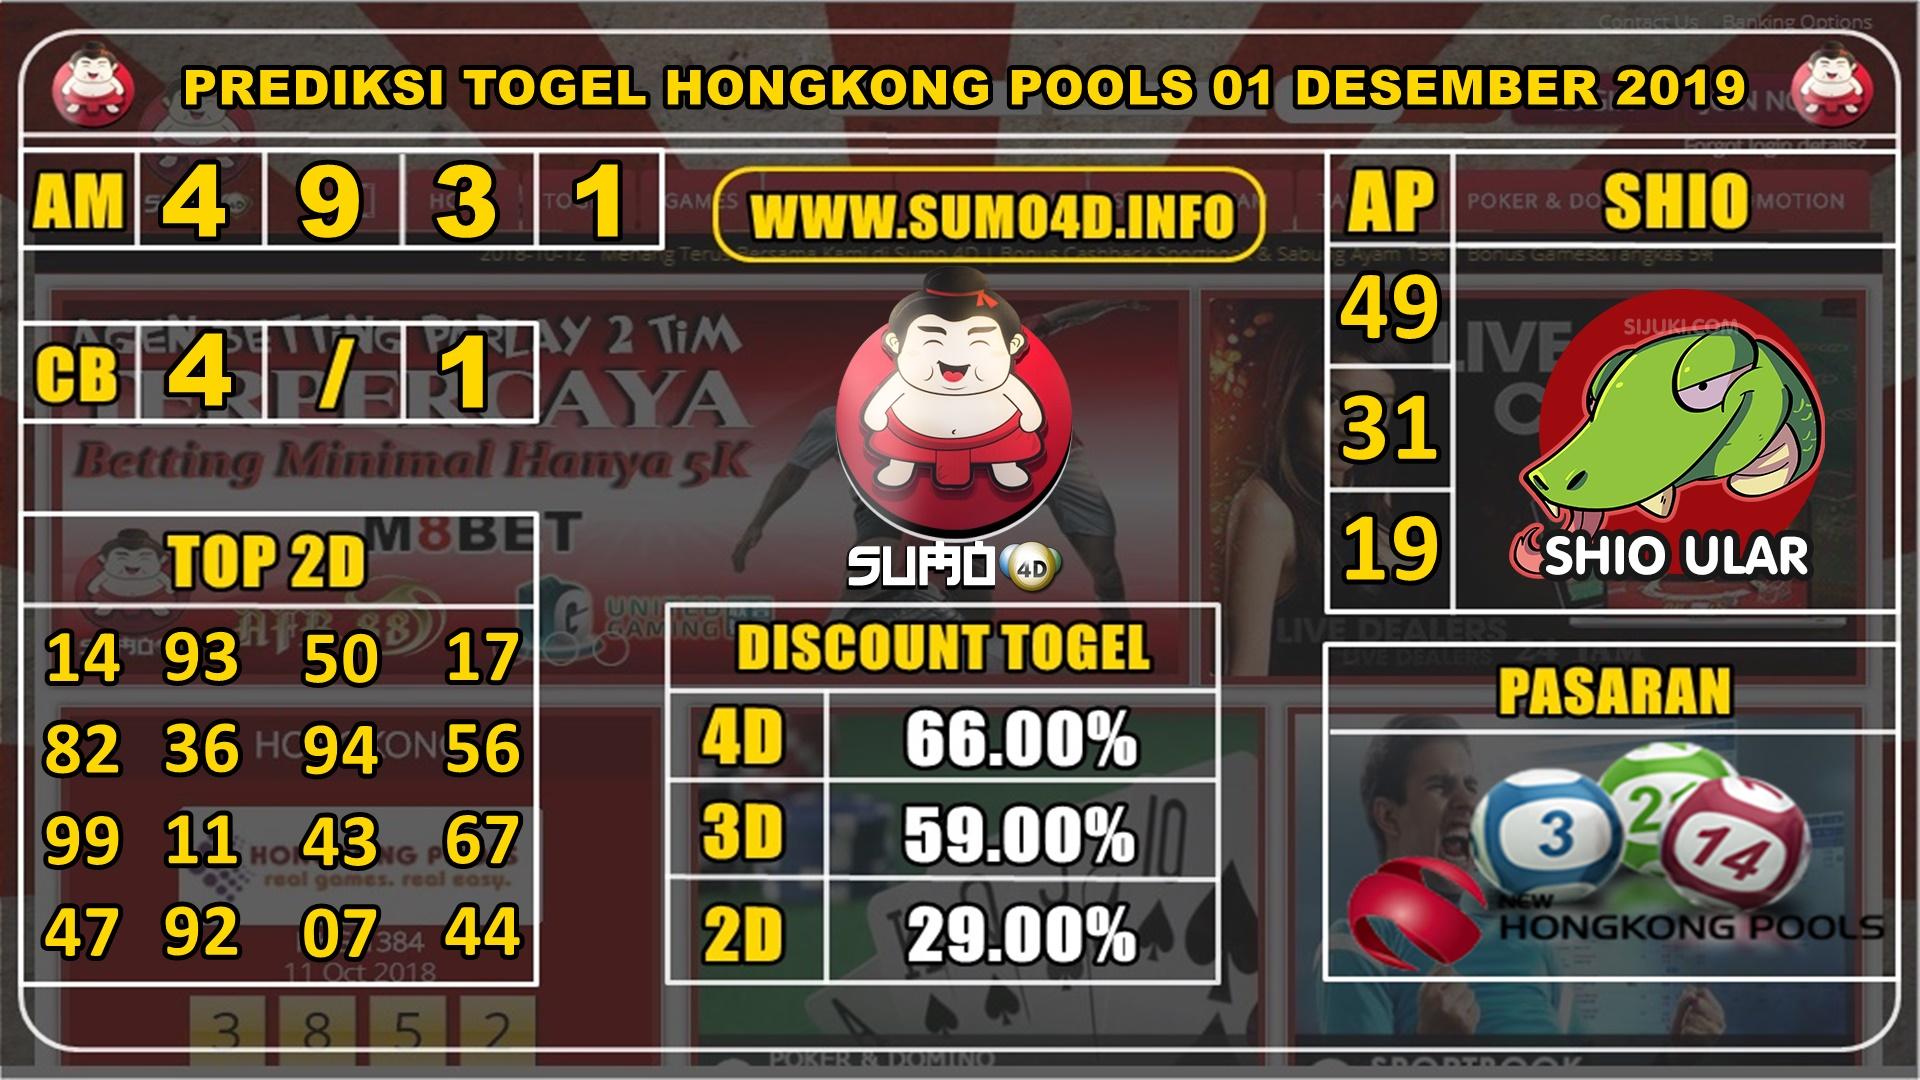 PREDIKSI TOGEL HONGKONG POOLS 01 DESEMBER 2019